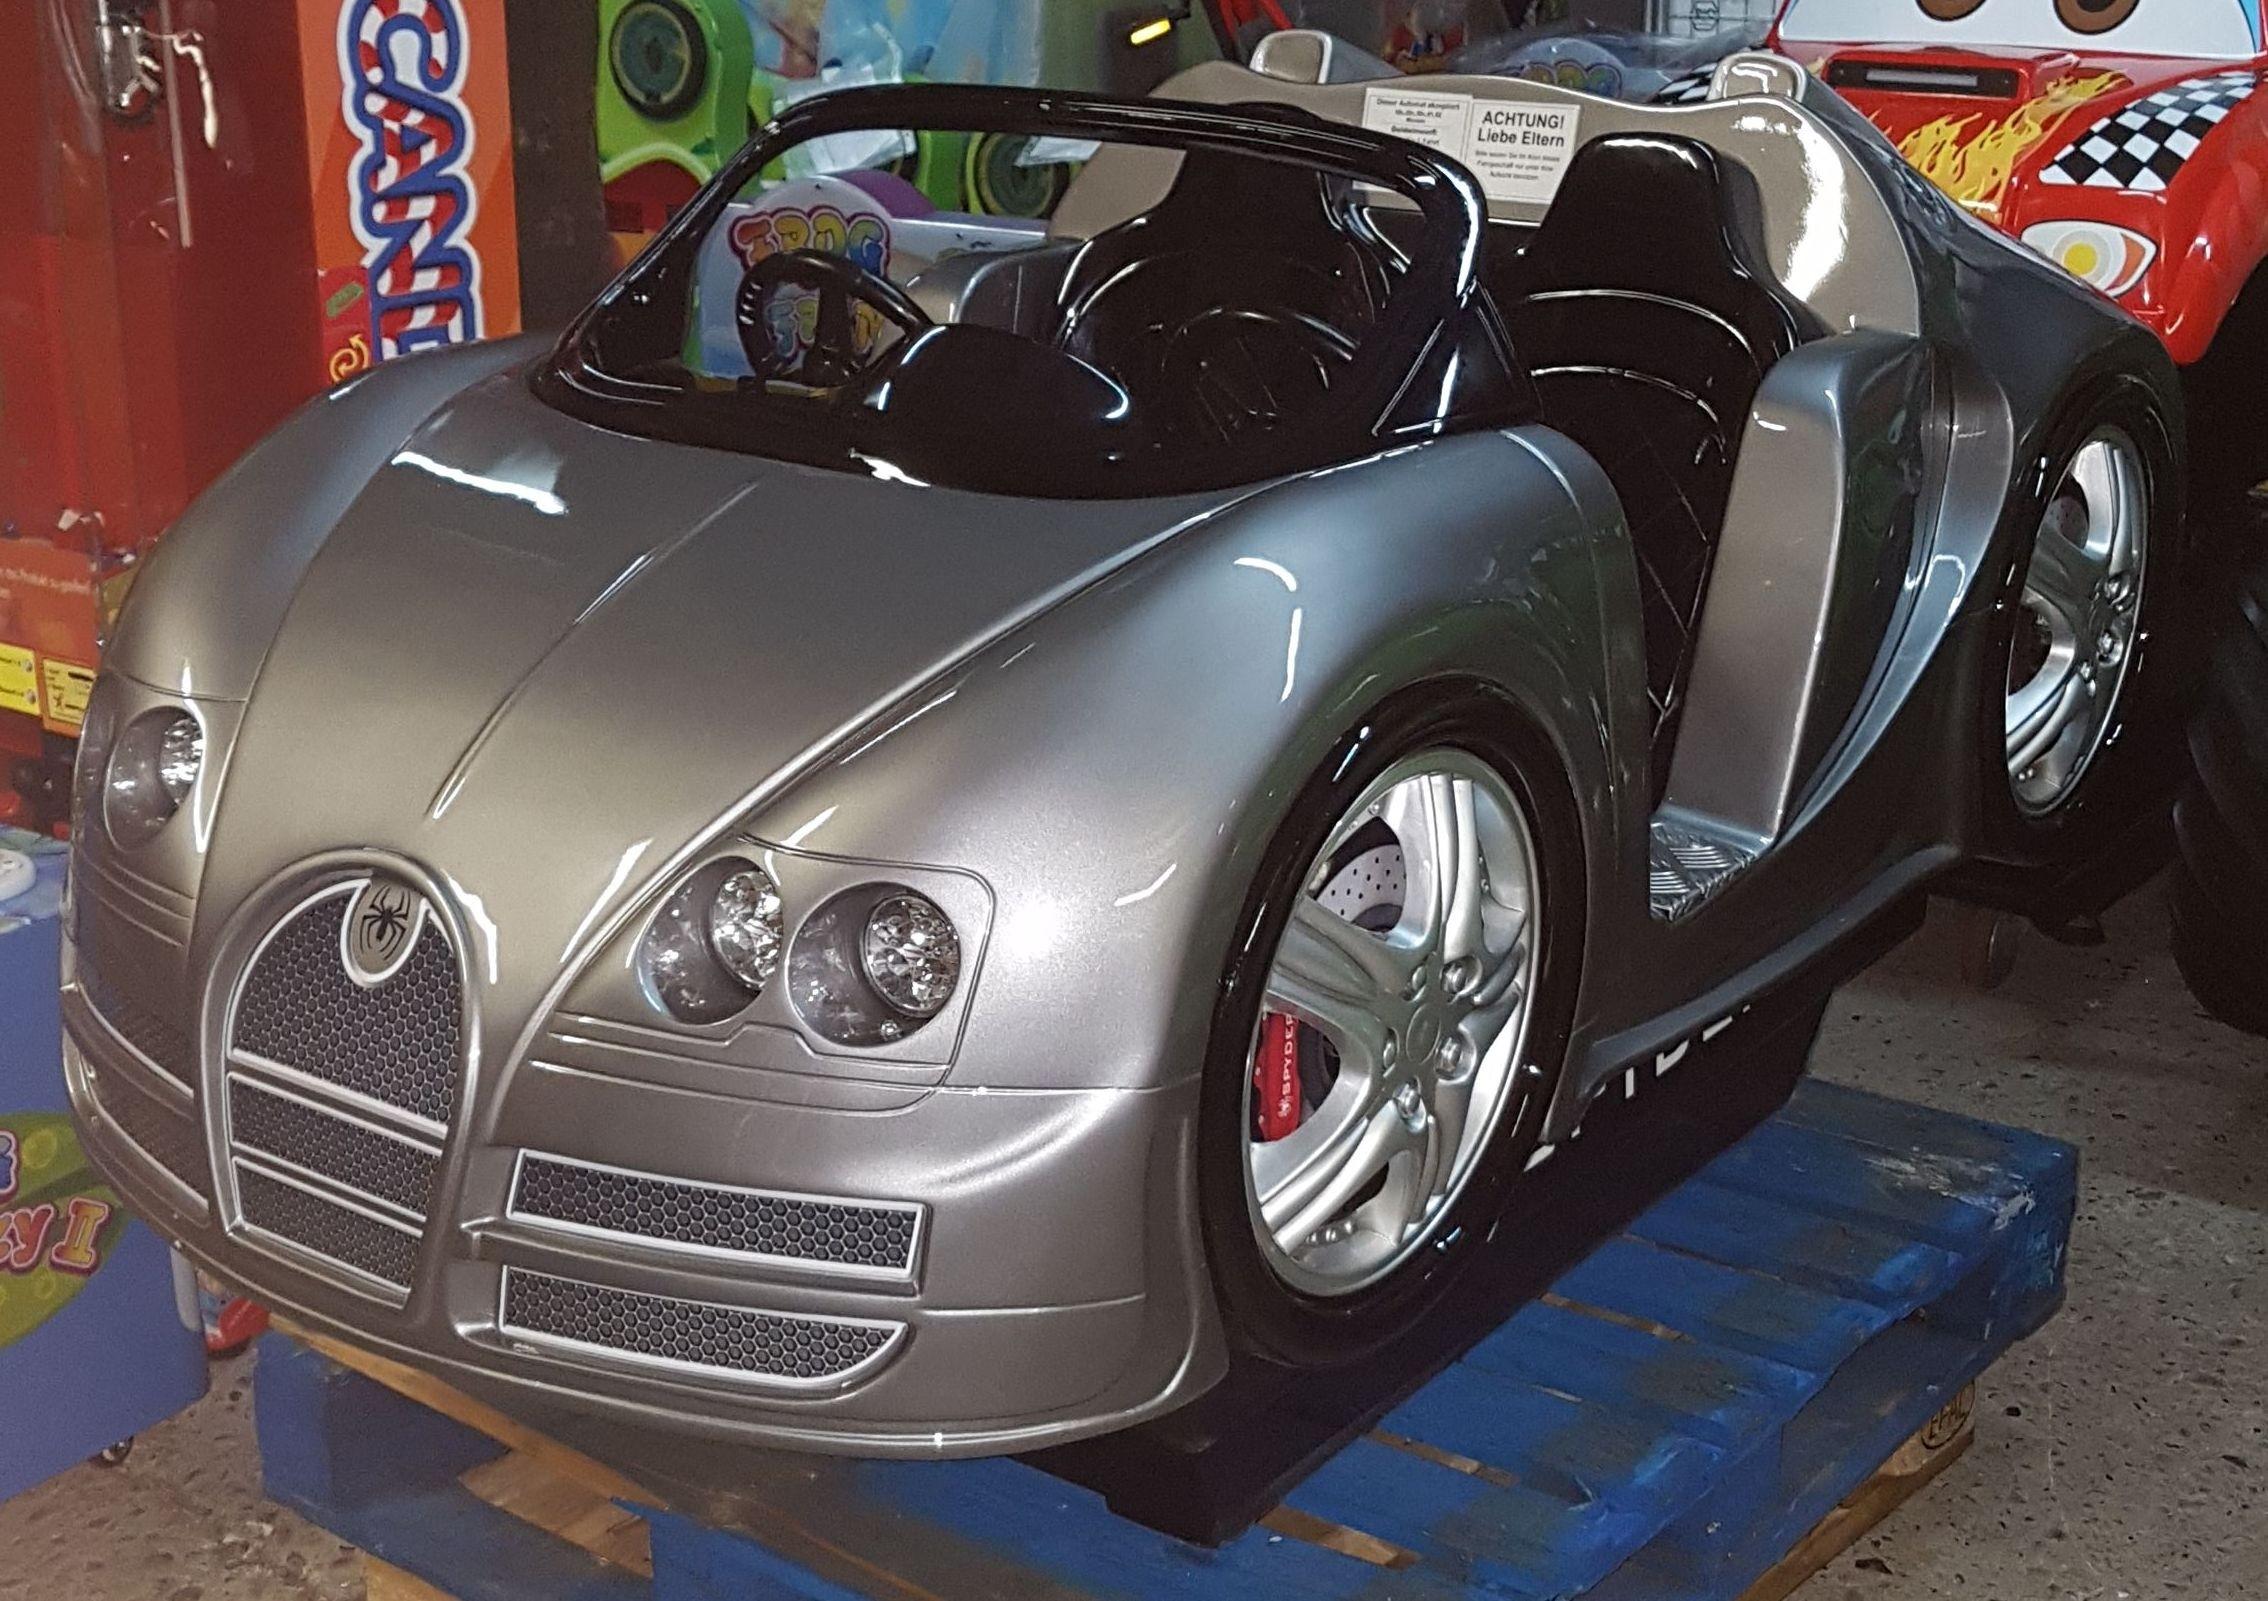 Rennwagen mit LED, silber-metallic